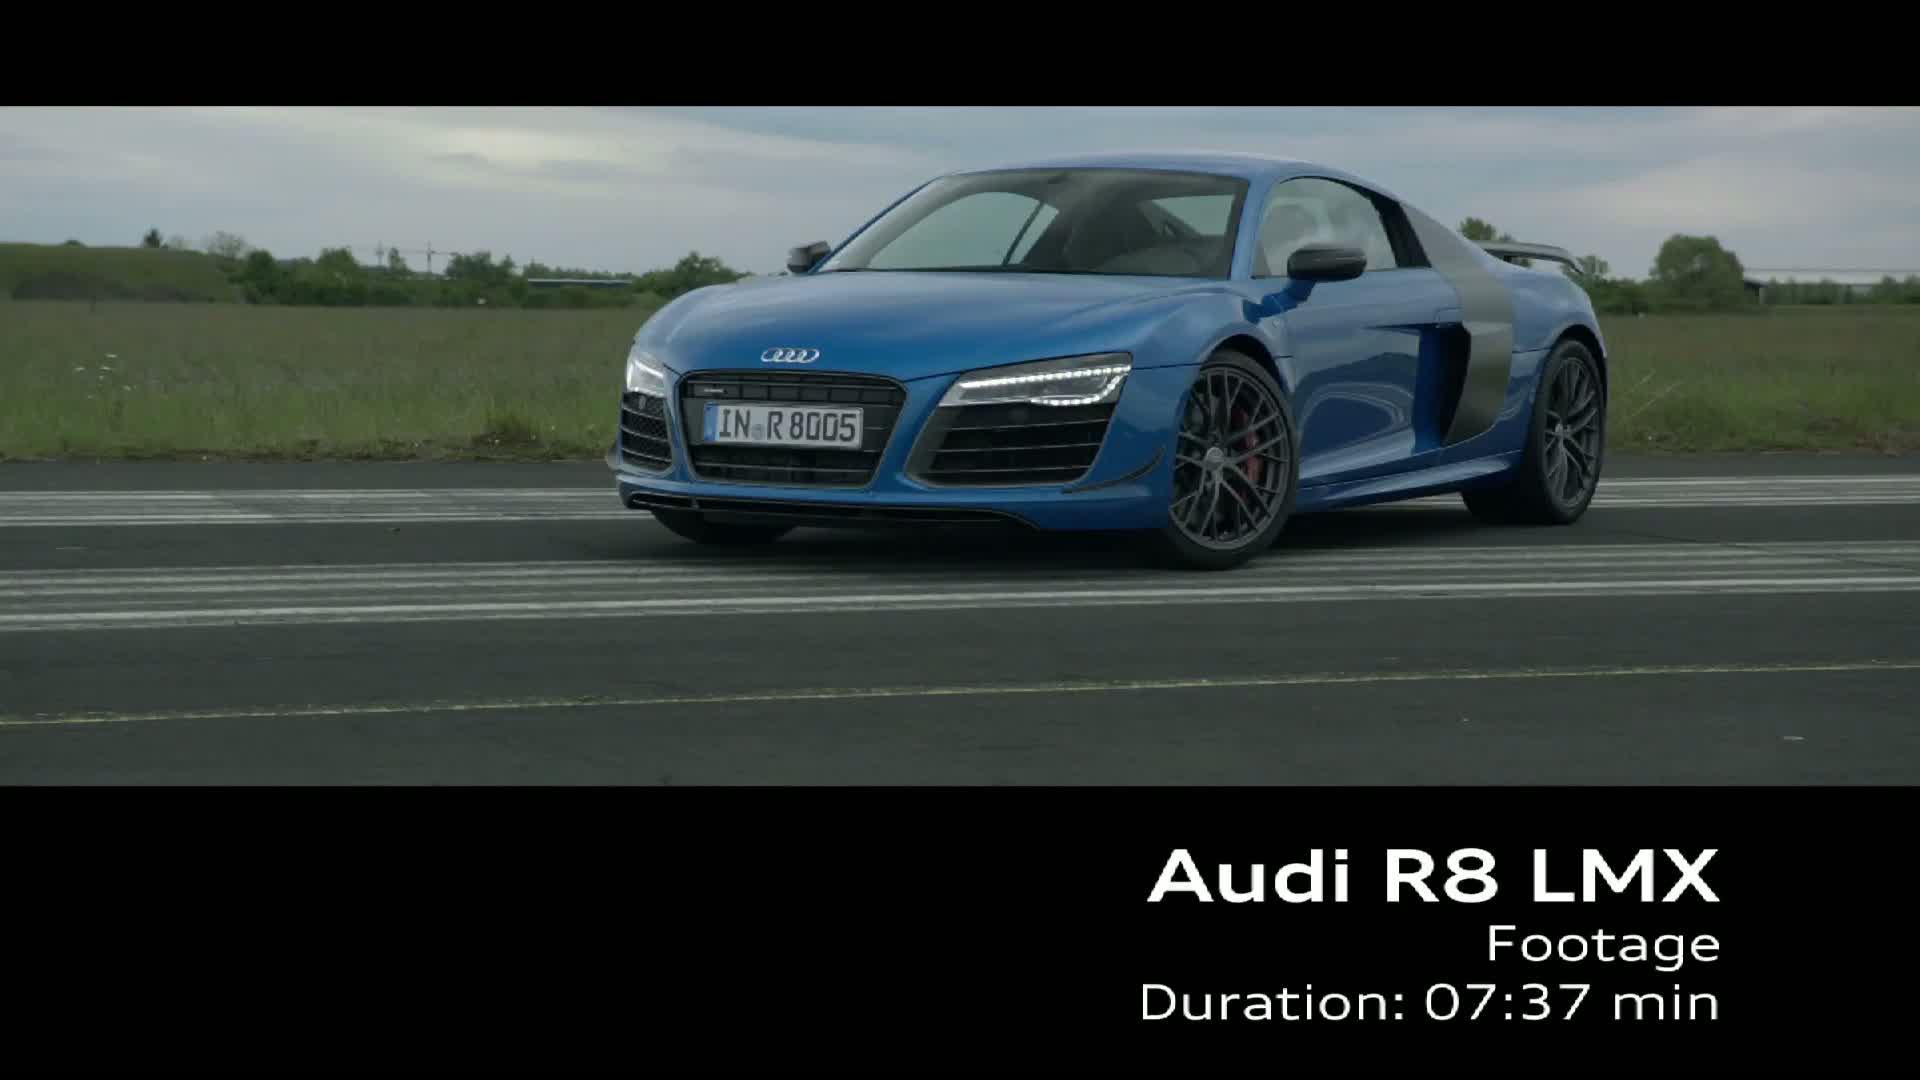 The Audi R8 LMX